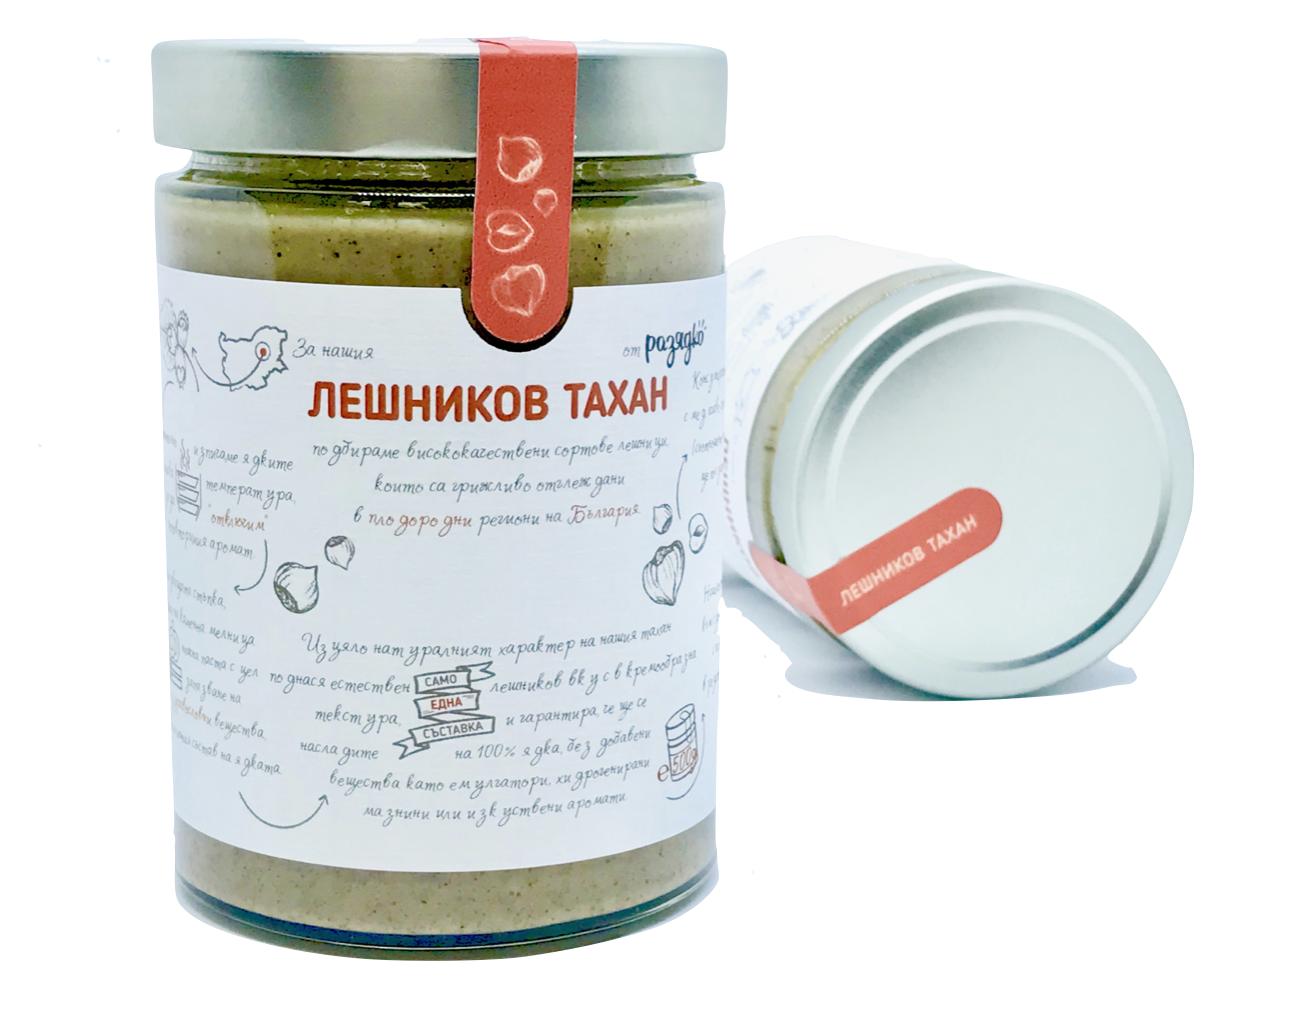 ЛЕШНИКОВ ТАХАН 500 g